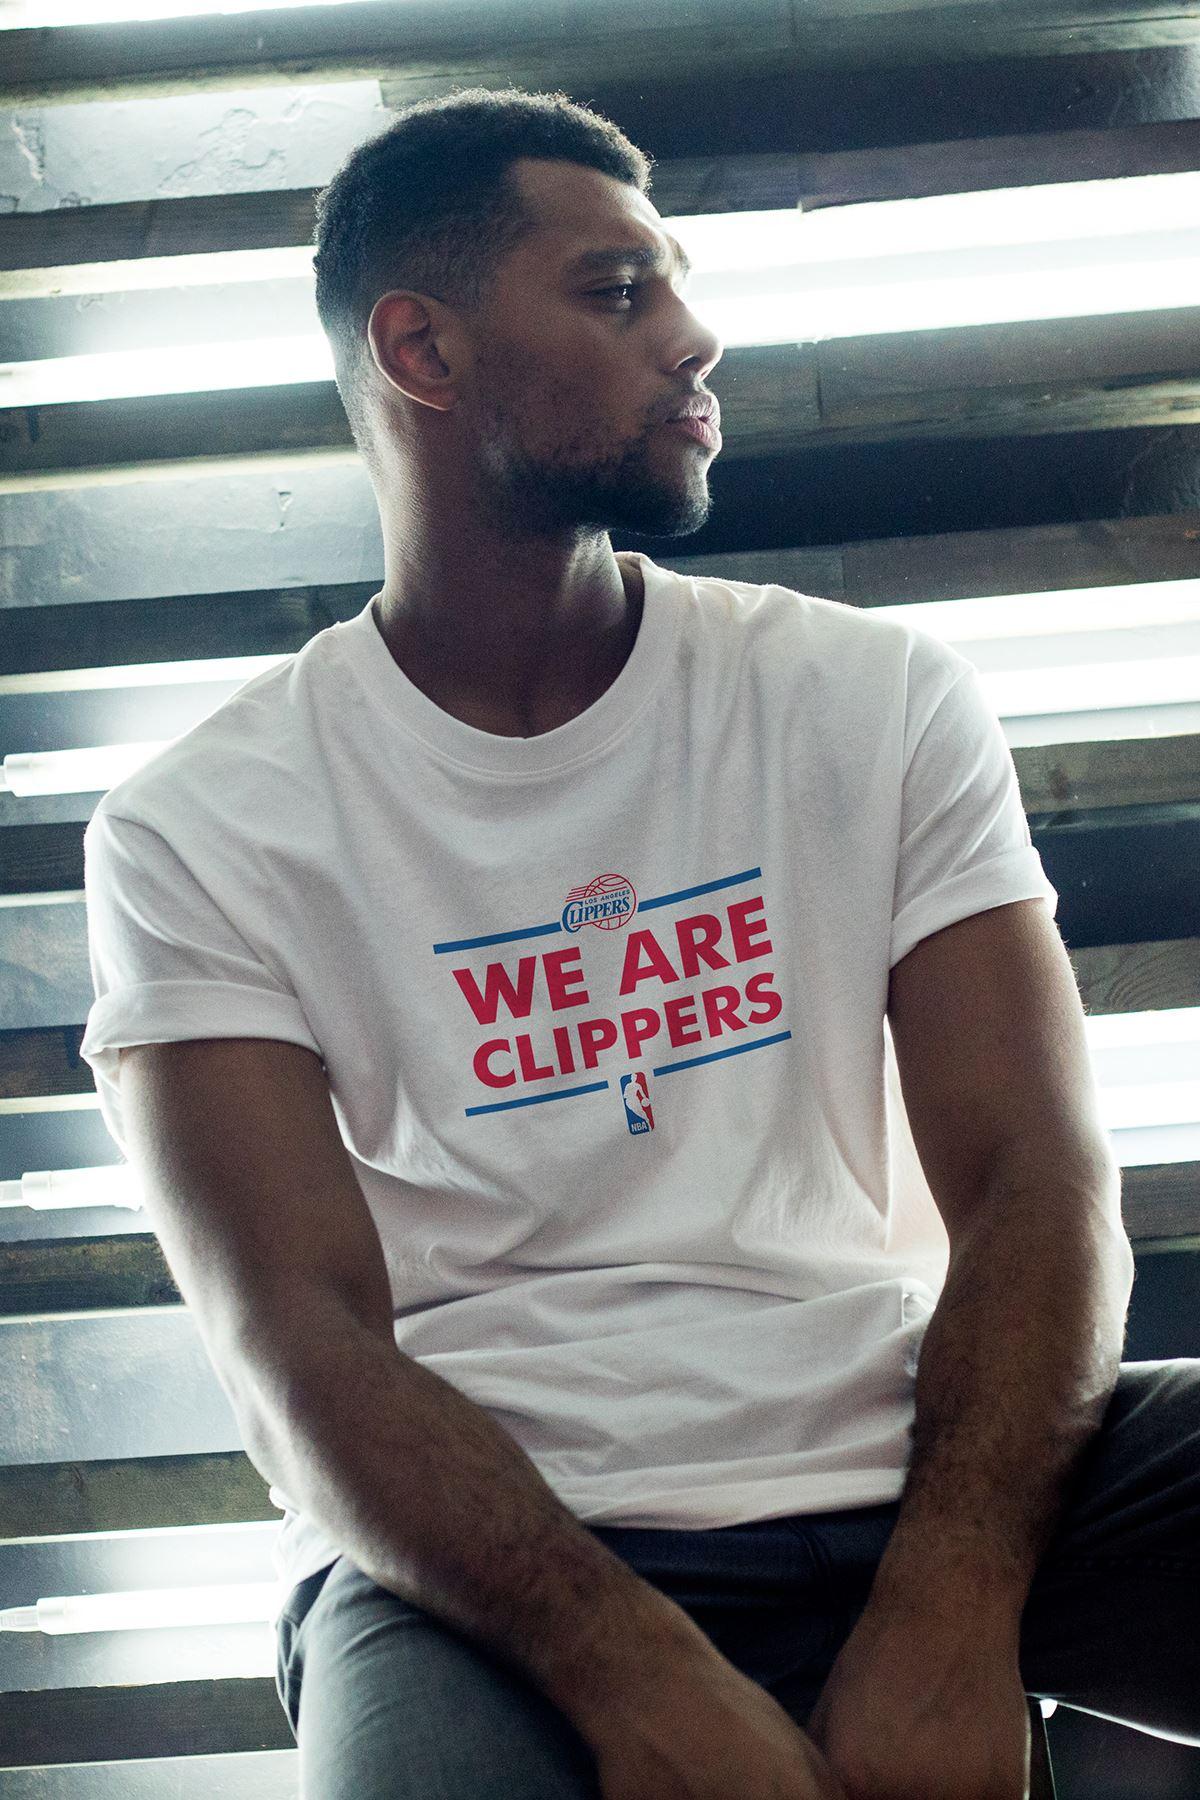 Clippers 164 Beyaz Erkek Oversize Tshirt - Tişört